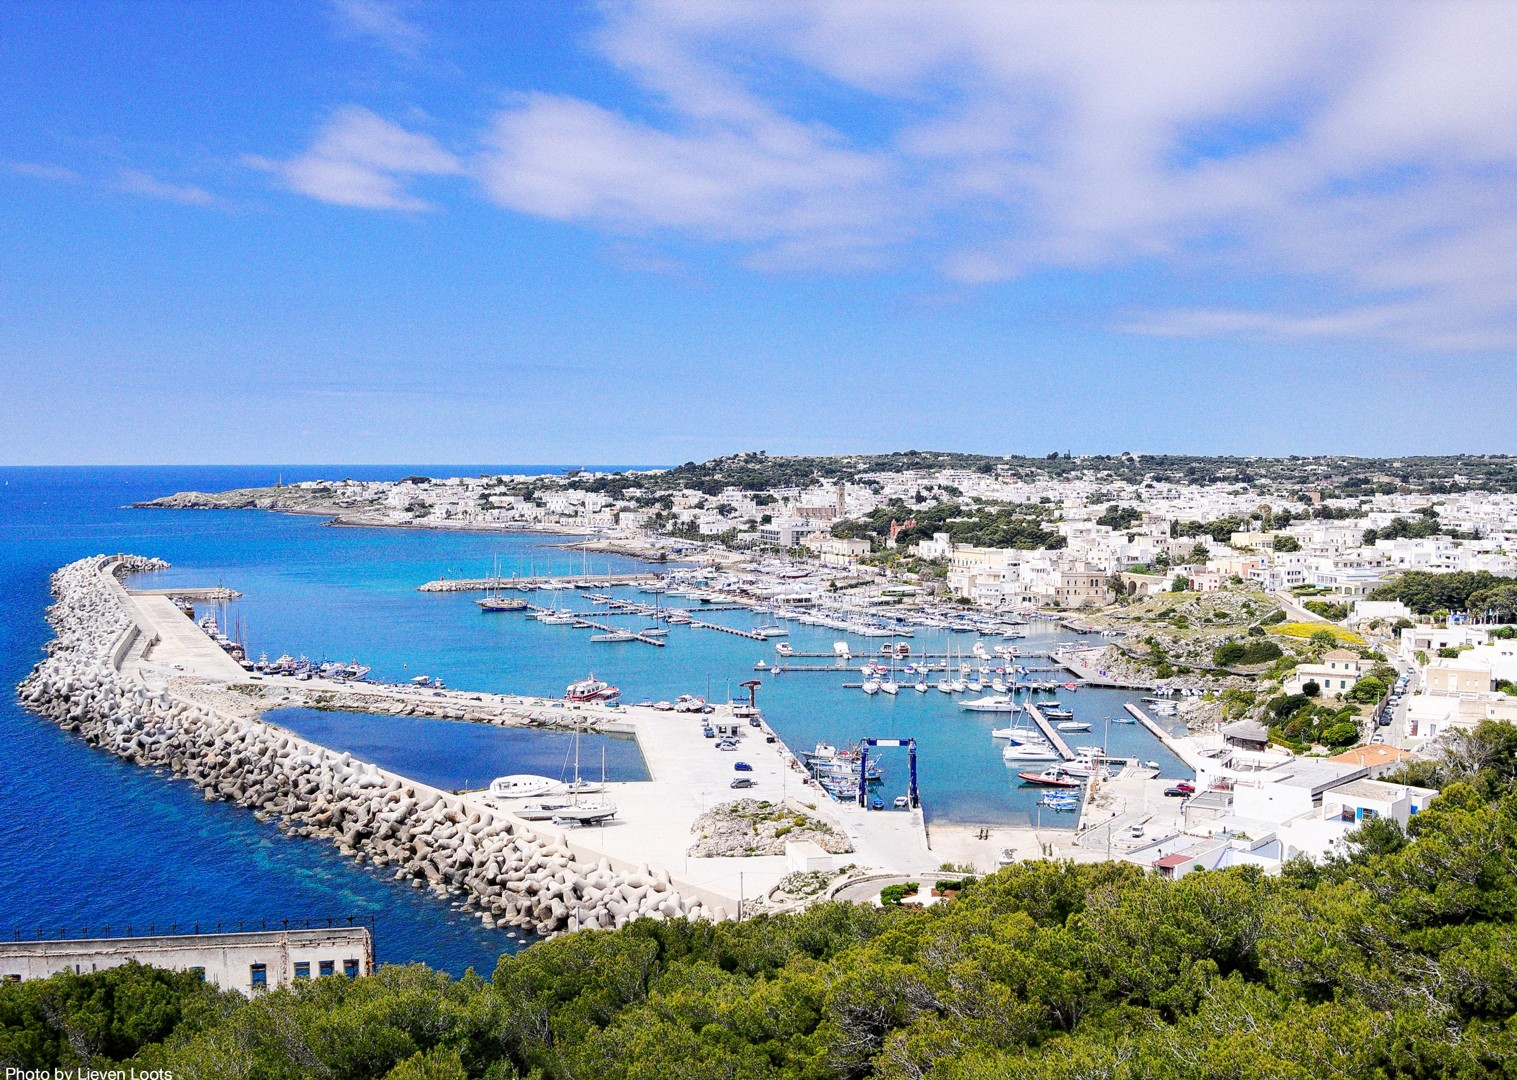 puglia-coast-marina-italy-cycling-holiday.jpg - Italy - Puglia - The Beautiful South - Self-Guided Road Cycling Holiday - Road Cycling